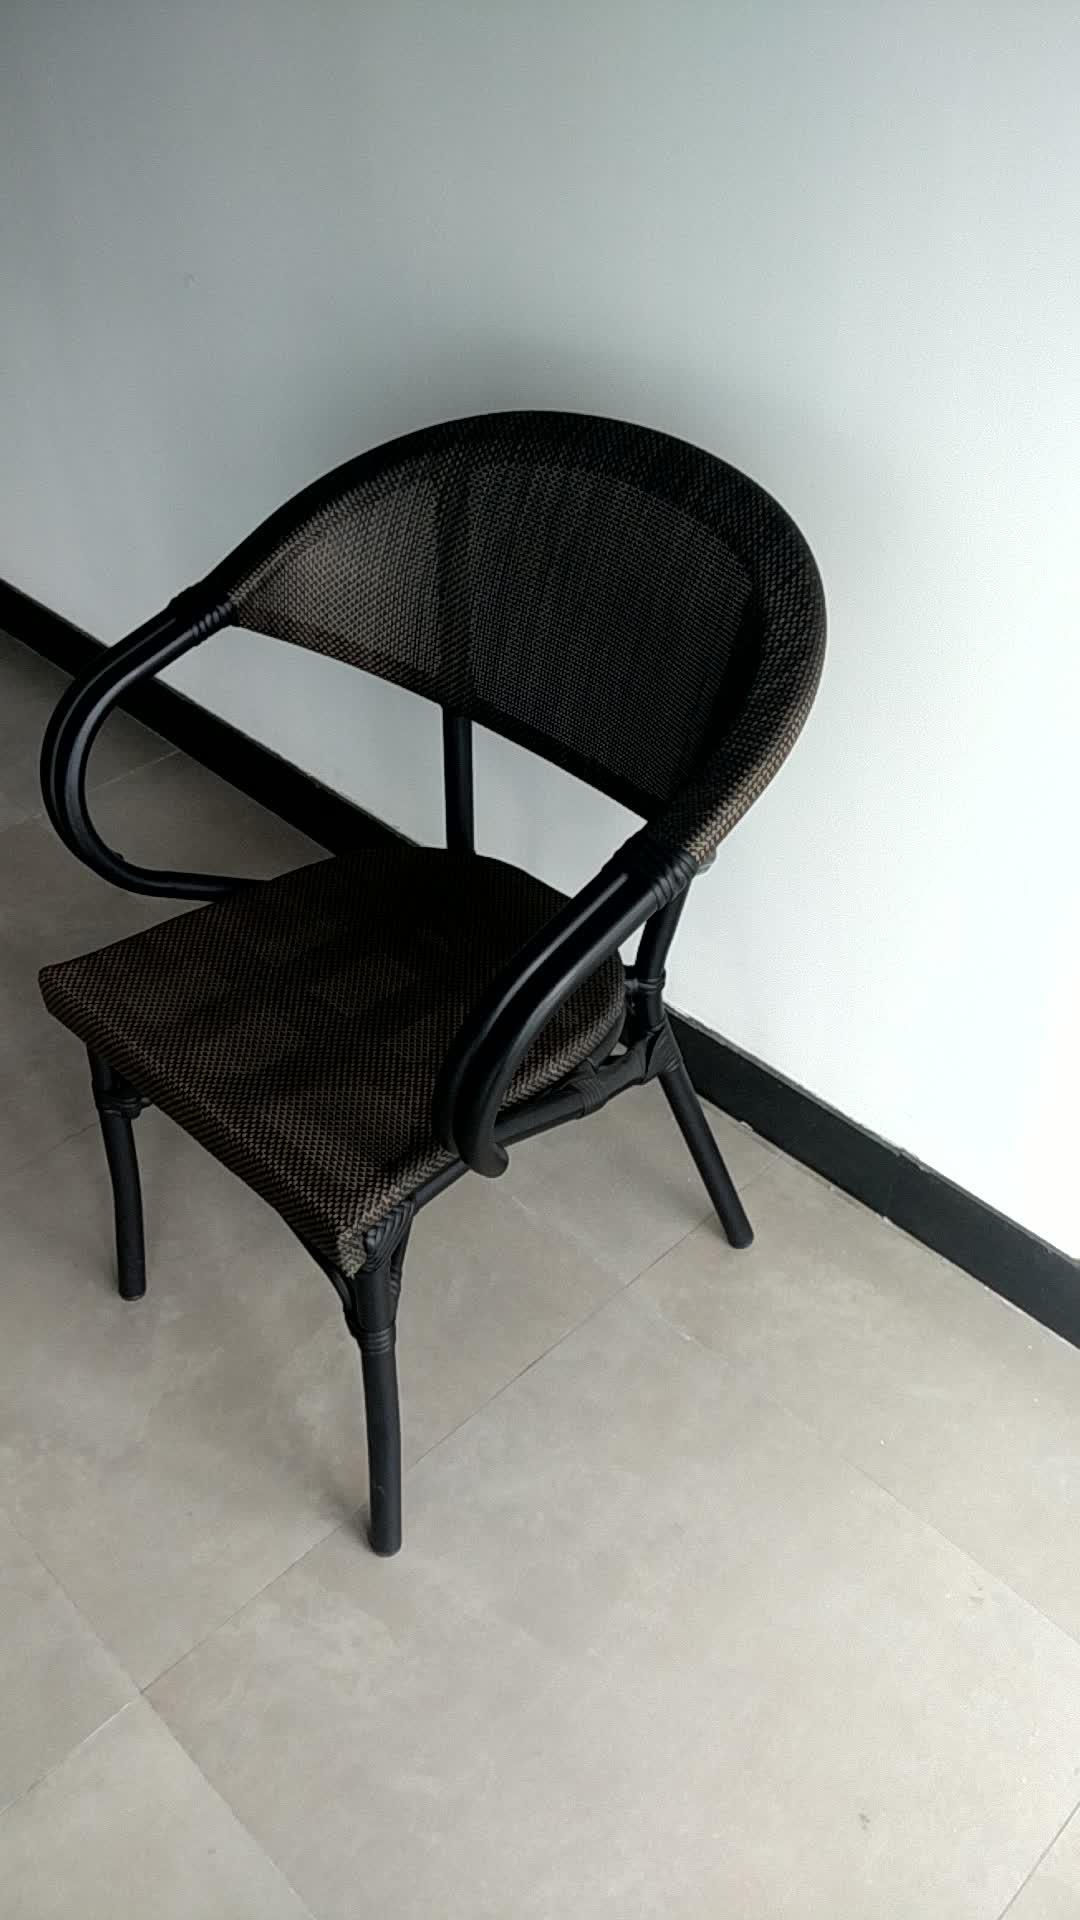 Handmade Outdoor Patio Furniture For Wholesale -E8029